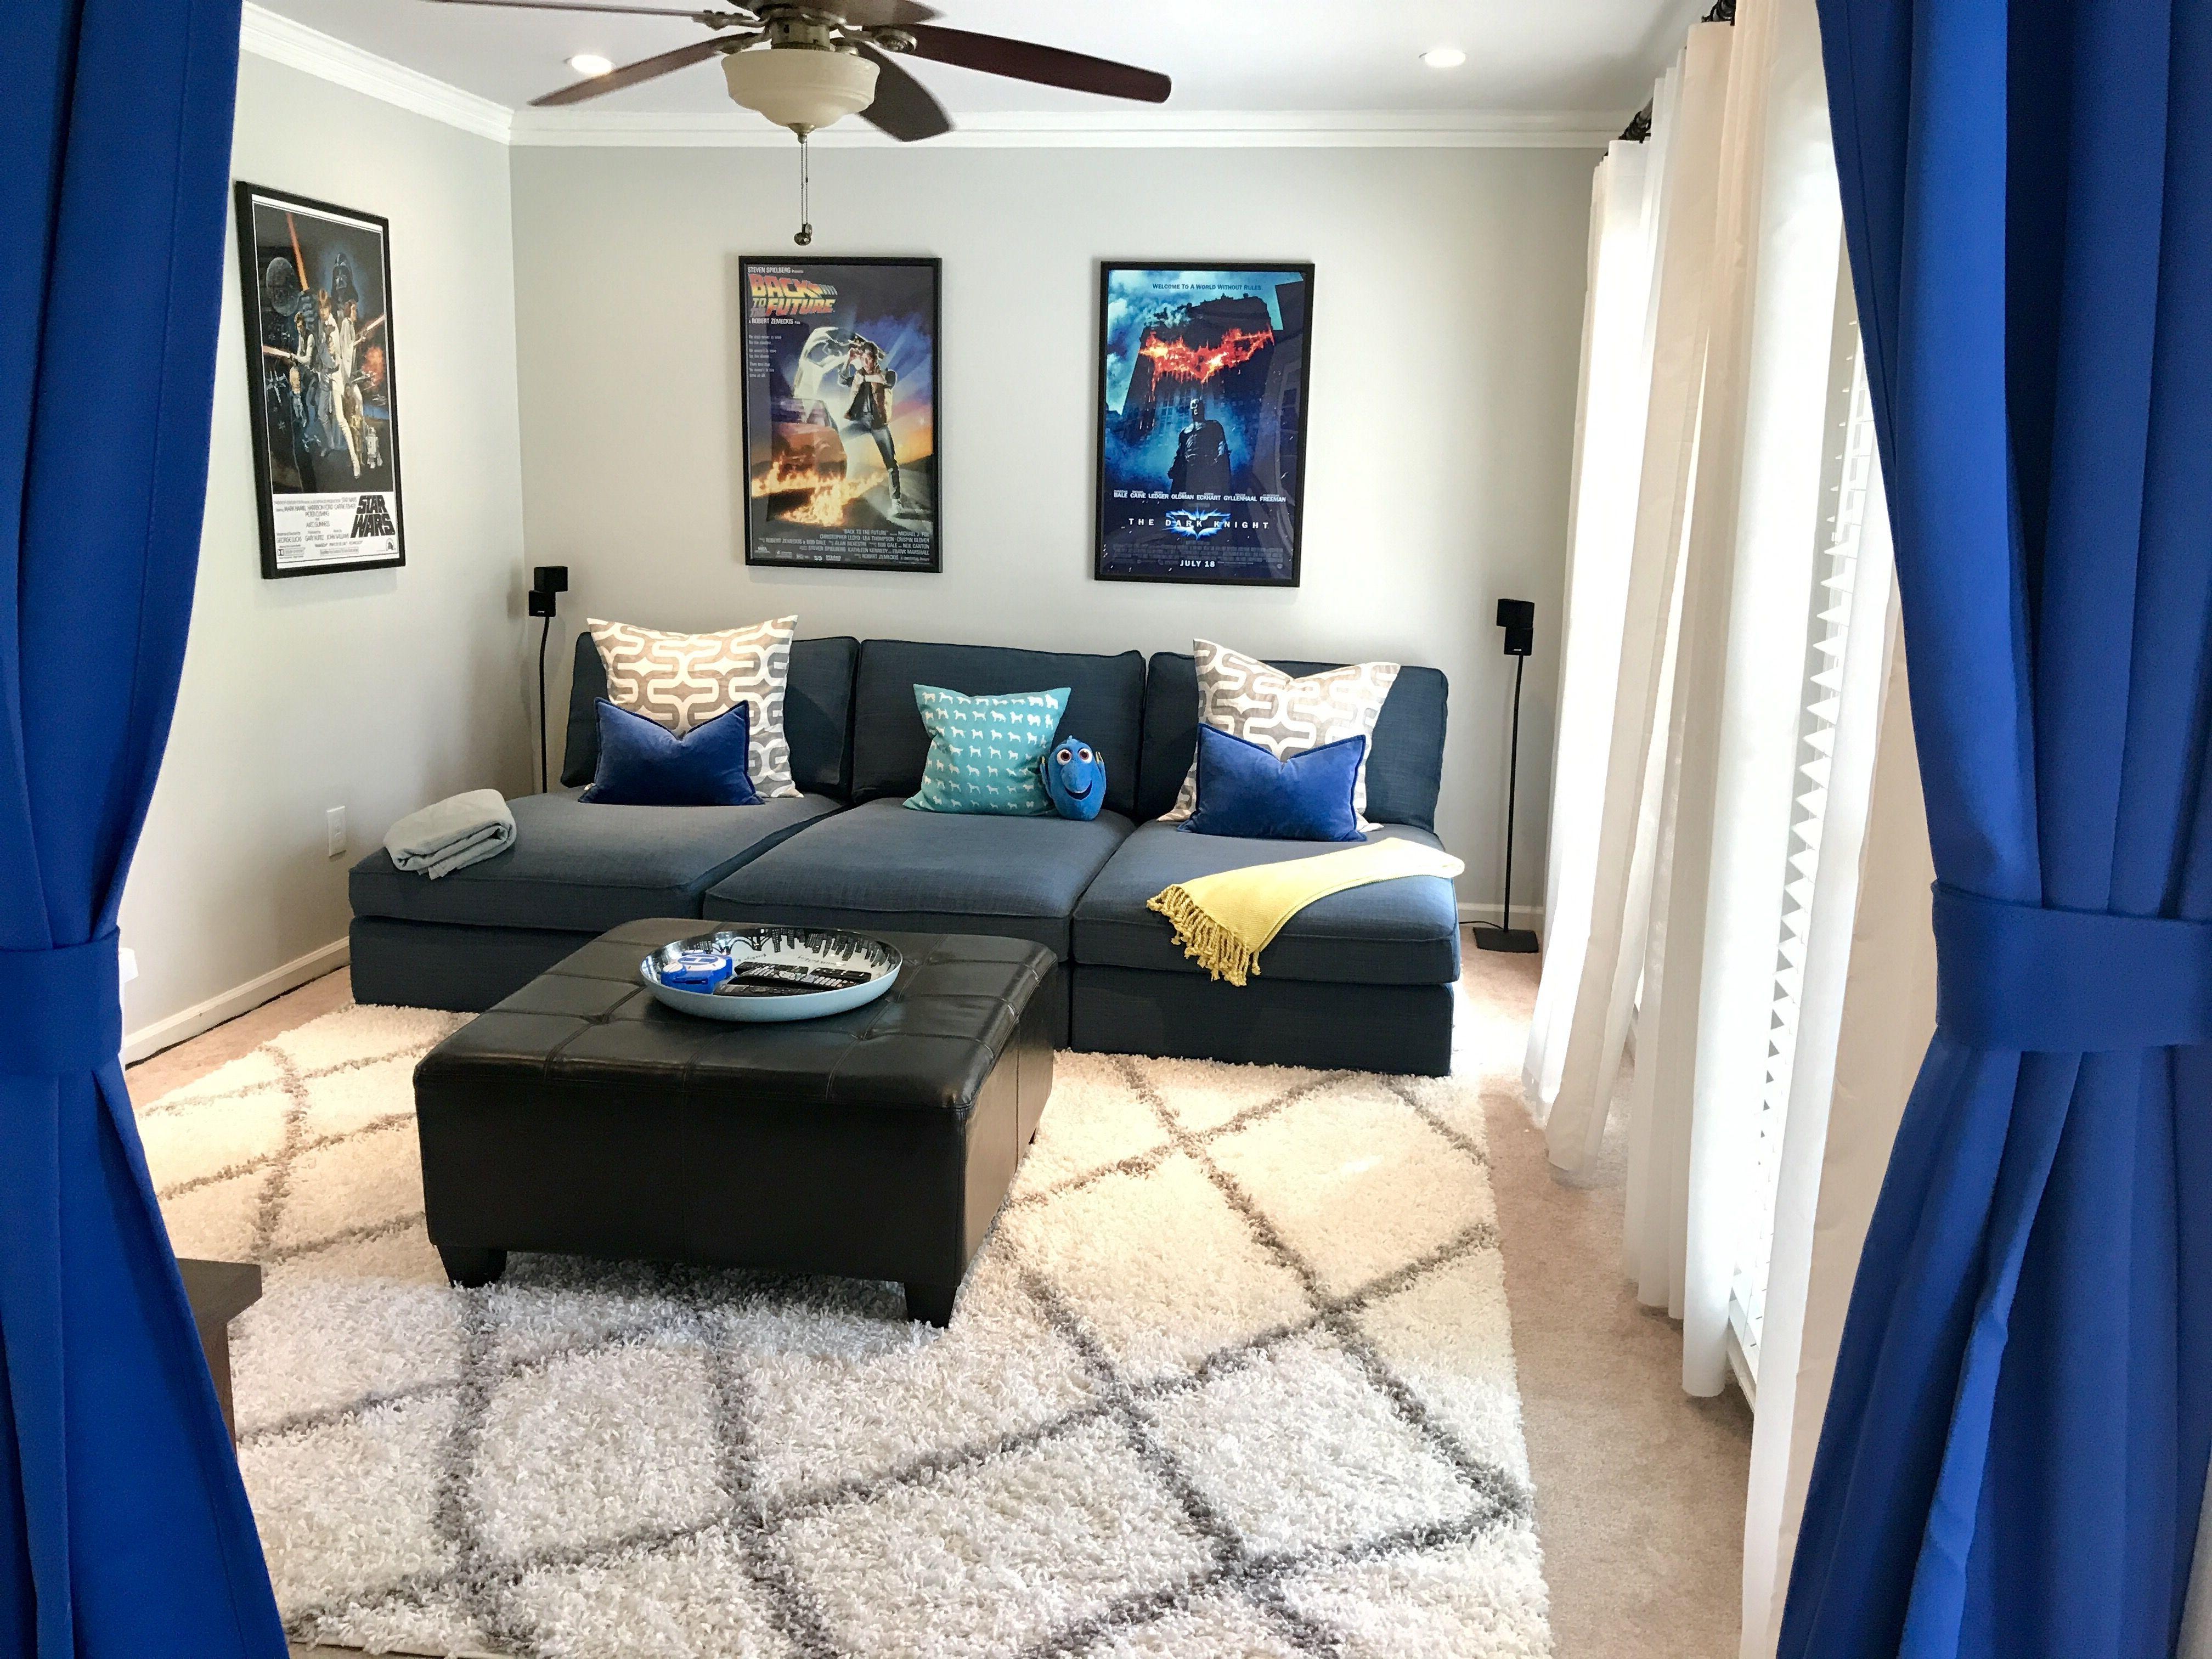 ikea kivik chaise couch hillared dark blue movie room room inspiration pinterest. Black Bedroom Furniture Sets. Home Design Ideas